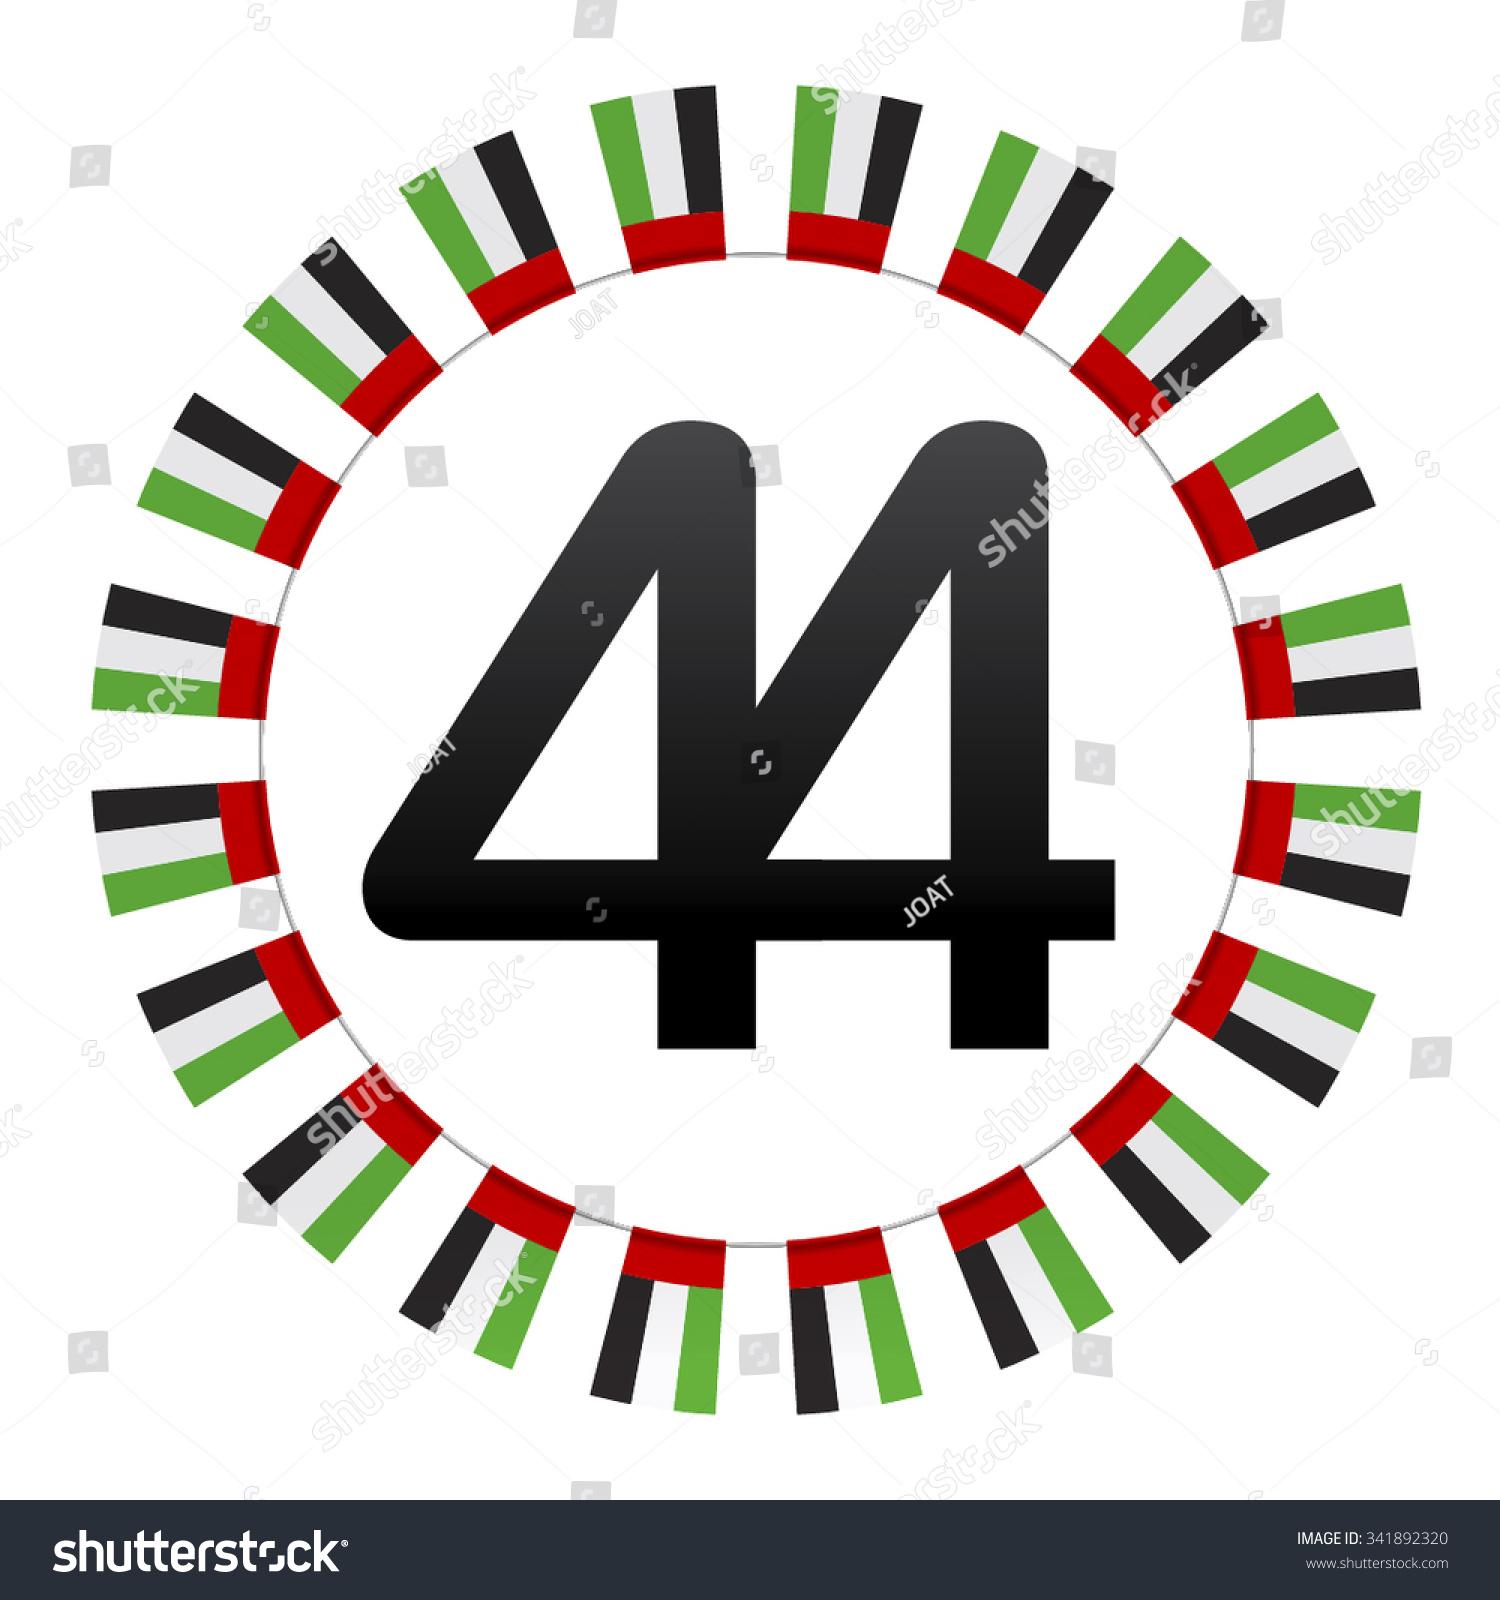 44th uae national day celebration logo stock vector 341892320 44th uae national day celebration logo unit with flag motifs around biocorpaavc Images